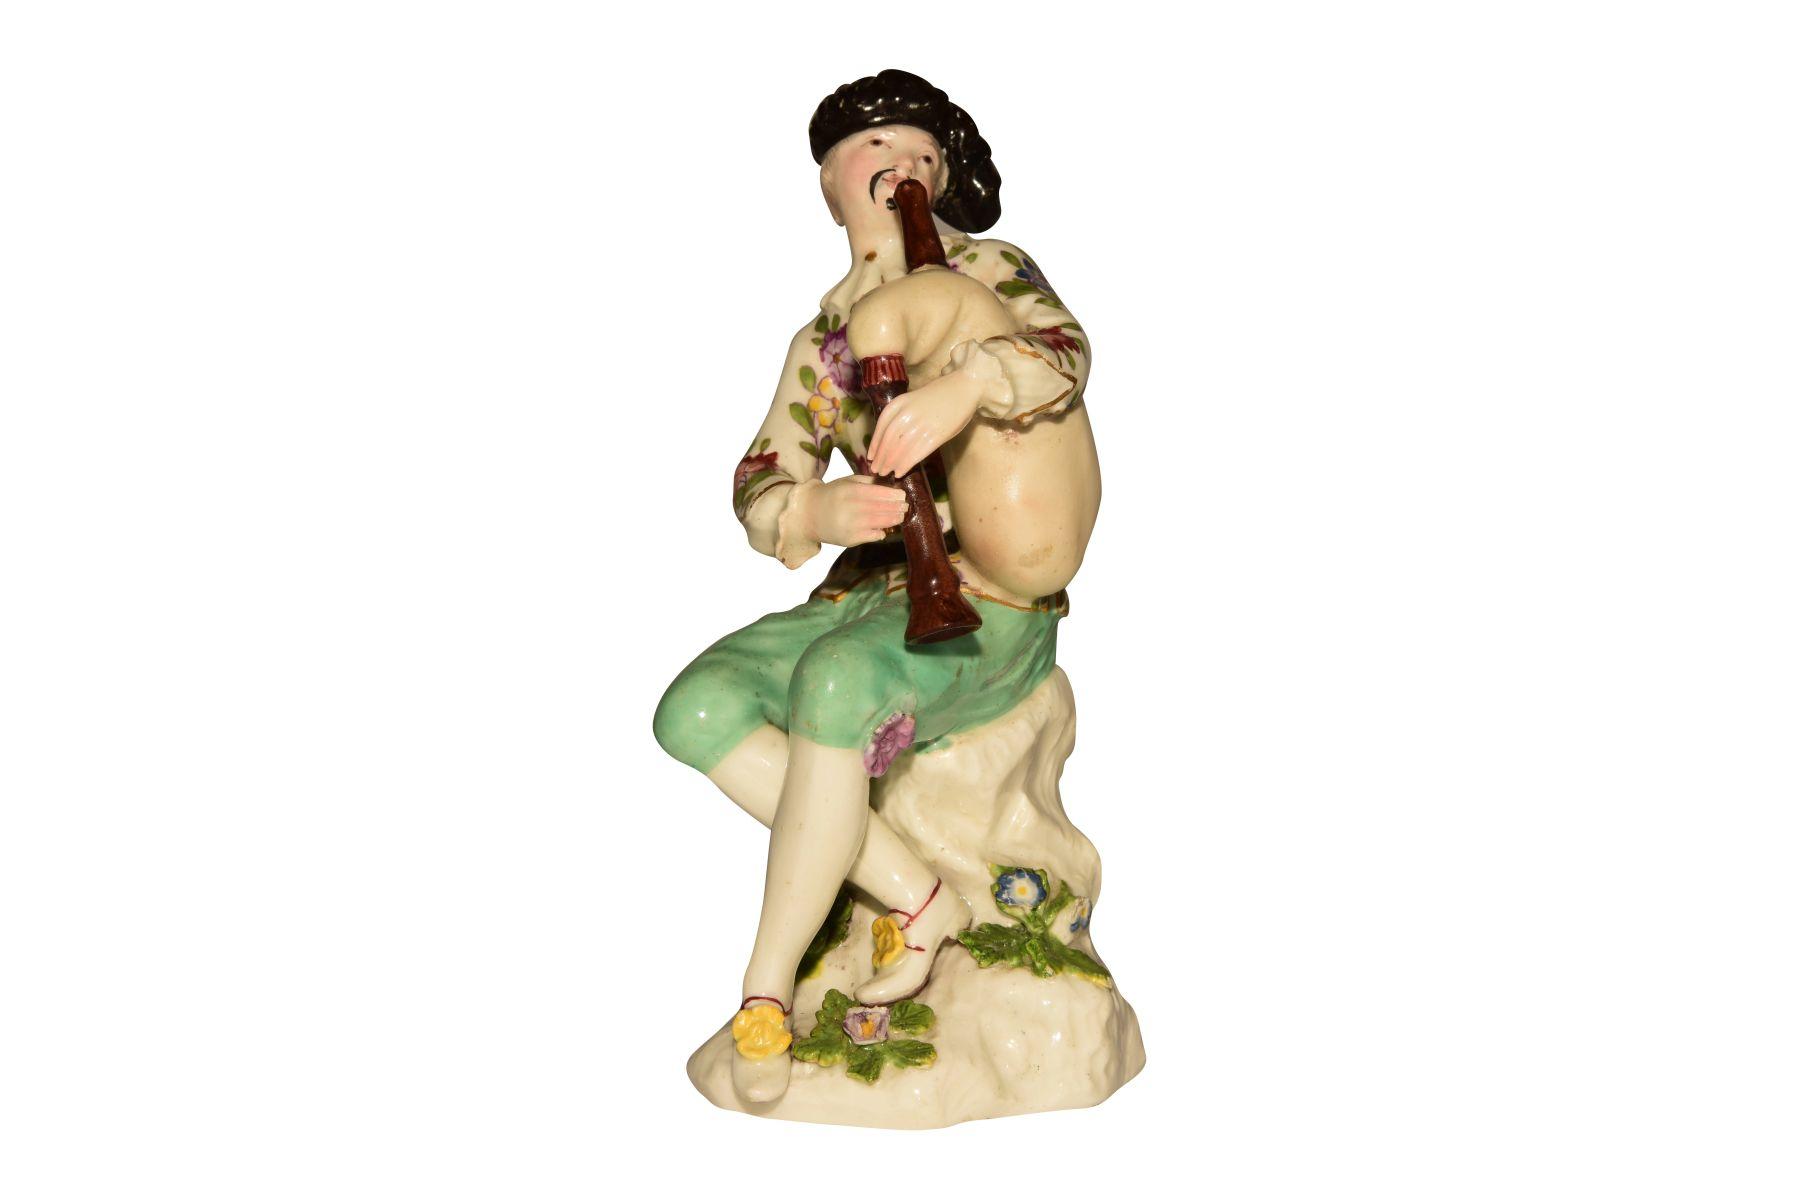 "#74 Harlequin with bagpipes Meissen 1745   ""Harlekin mit Dudelsack"" Meissen 1745 Image"